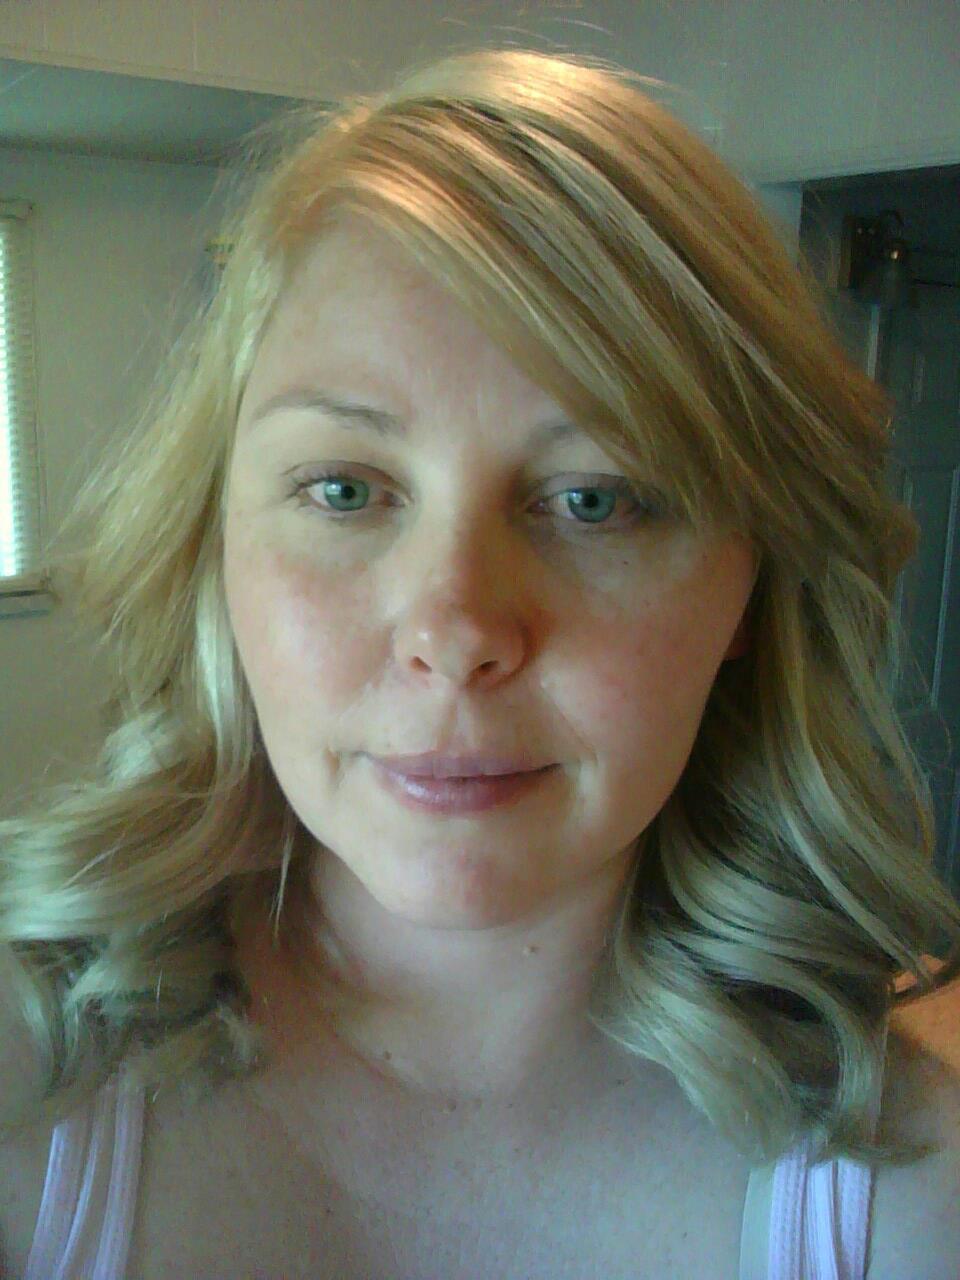 Curled blonde hair